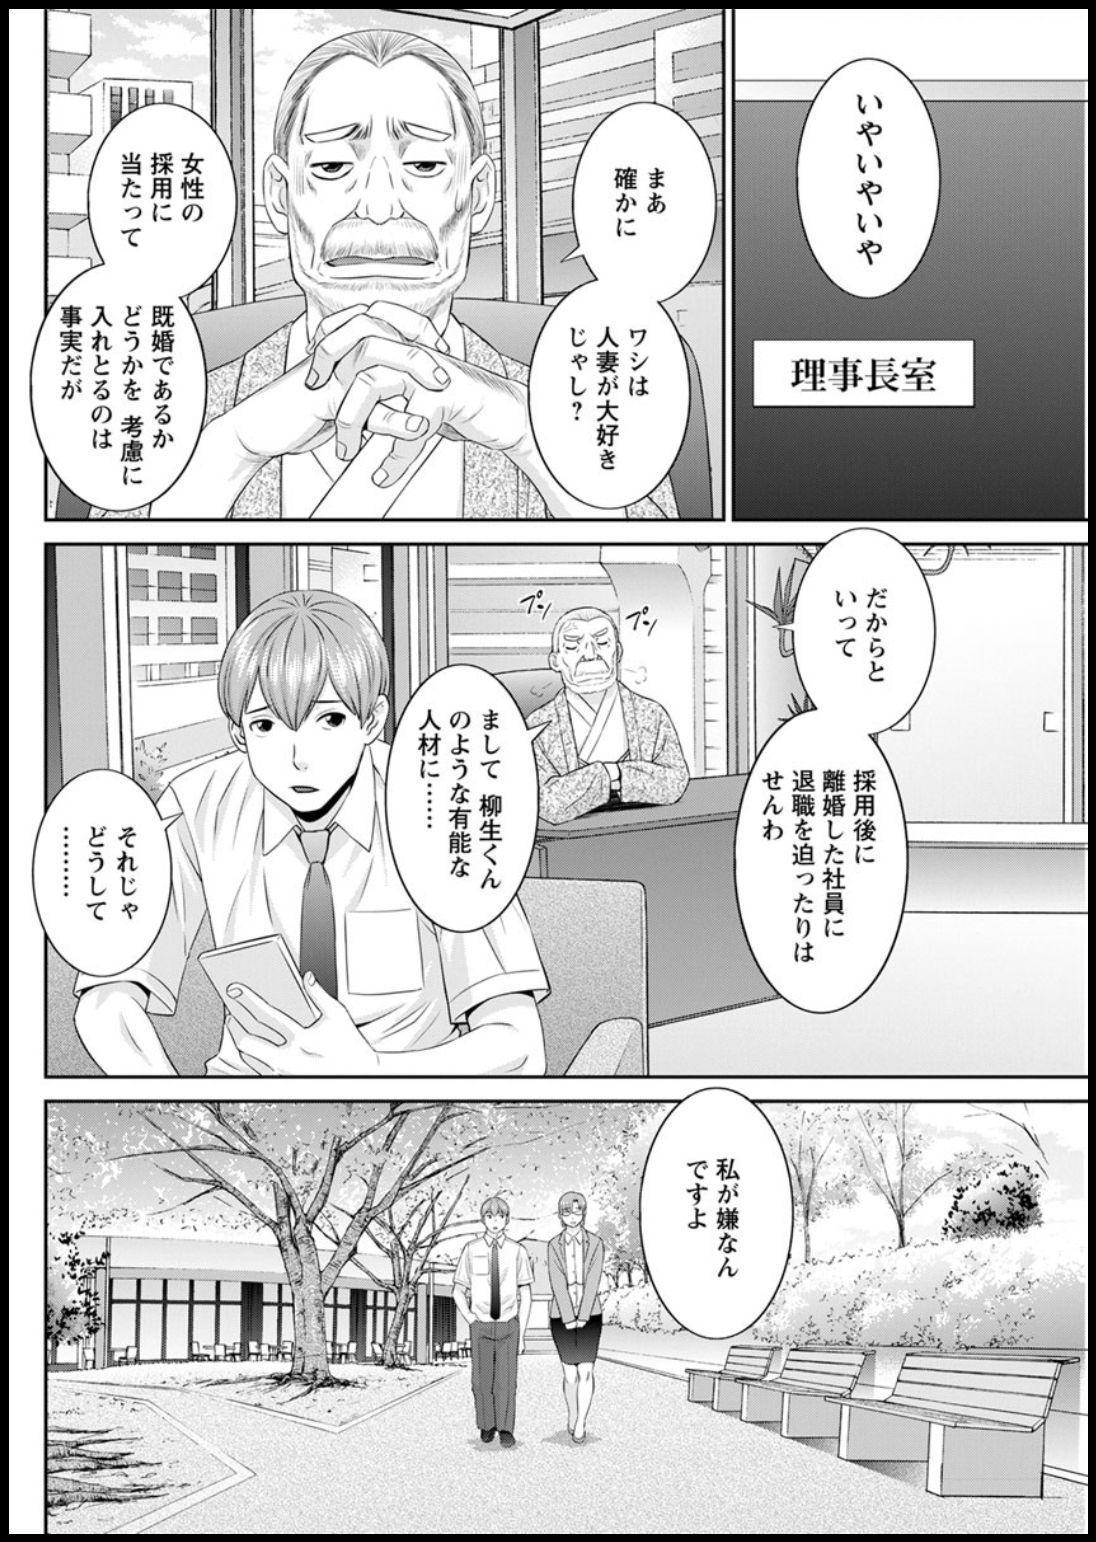 [Kawamori Misaki] Kaikan Hitotsuma Gakuen Ch. 1-6, 8-16 [Digital] 149